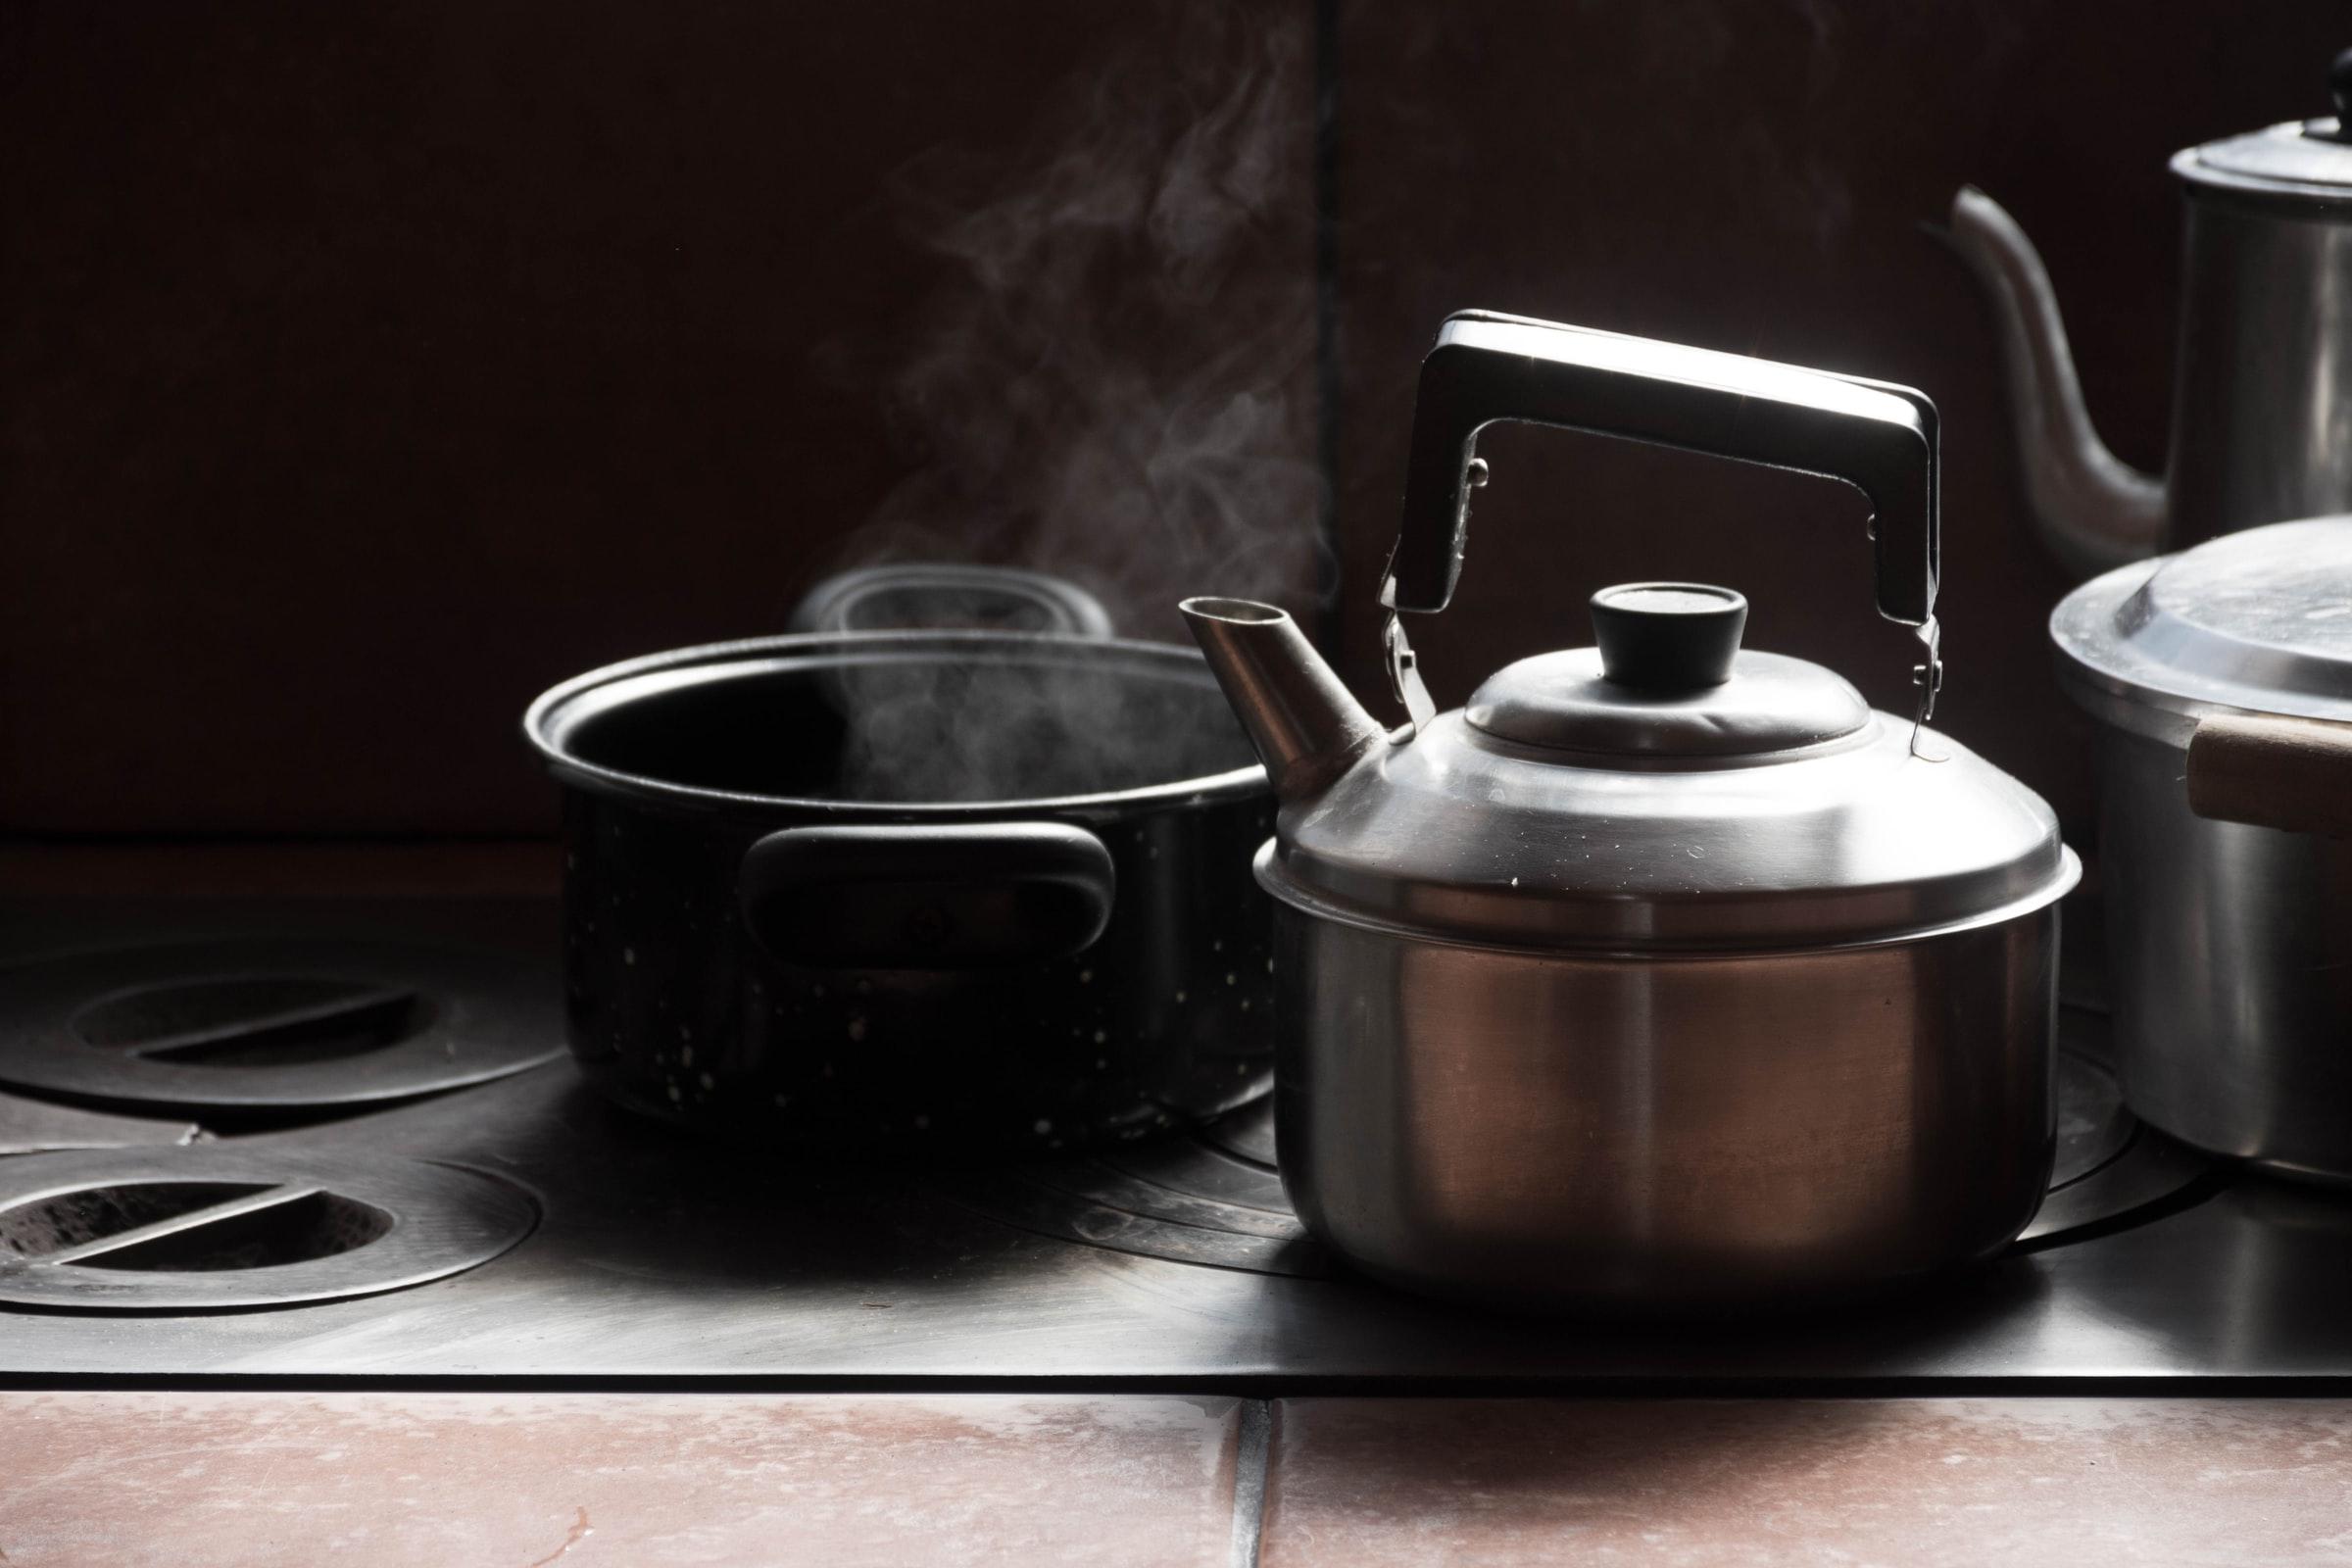 cocianndo con cacerolas